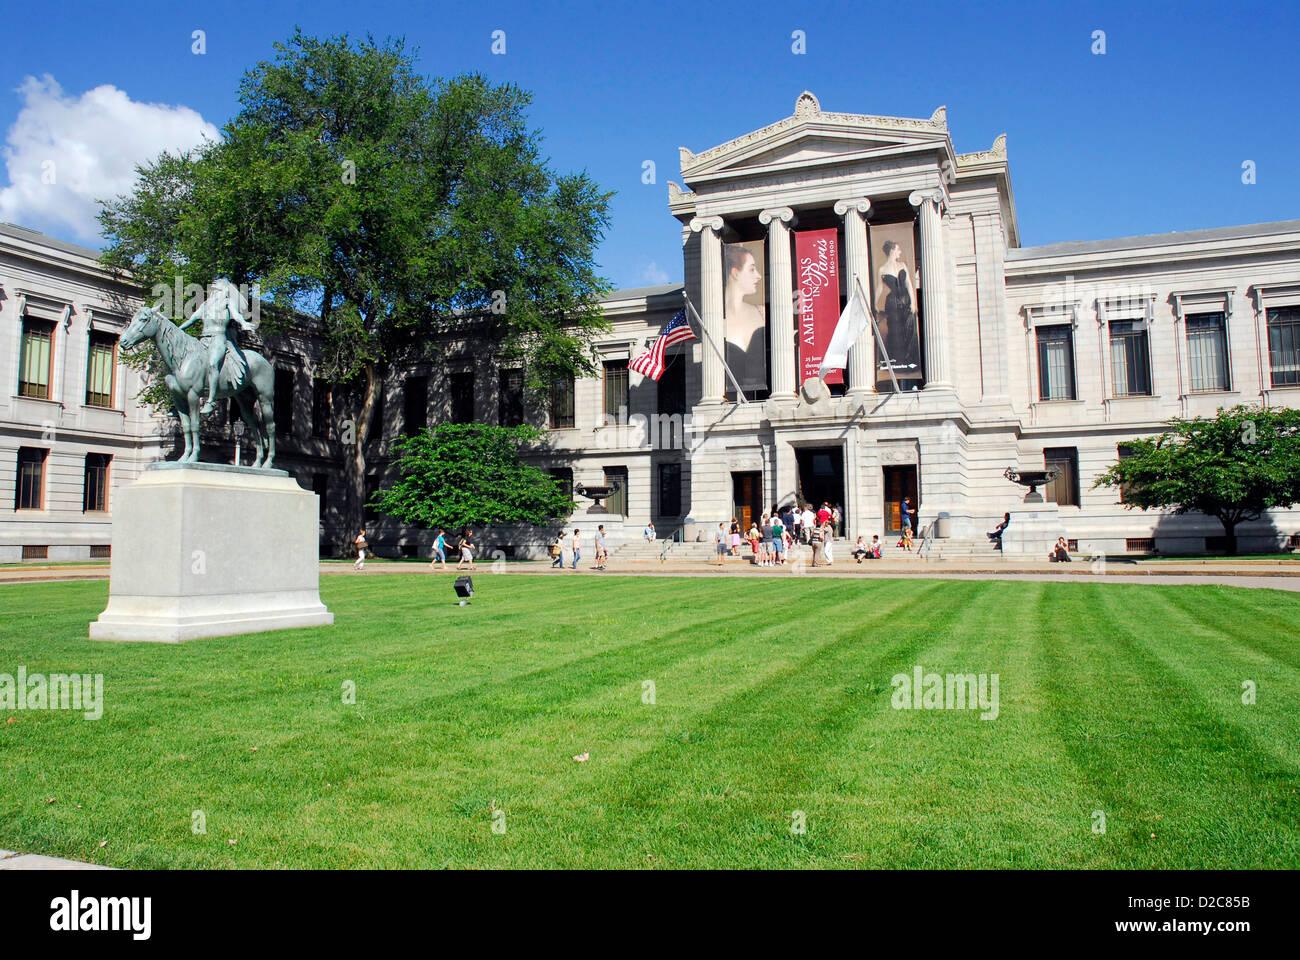 Le Massachusetts, Boston, Museum of Fine Arts Photo Stock